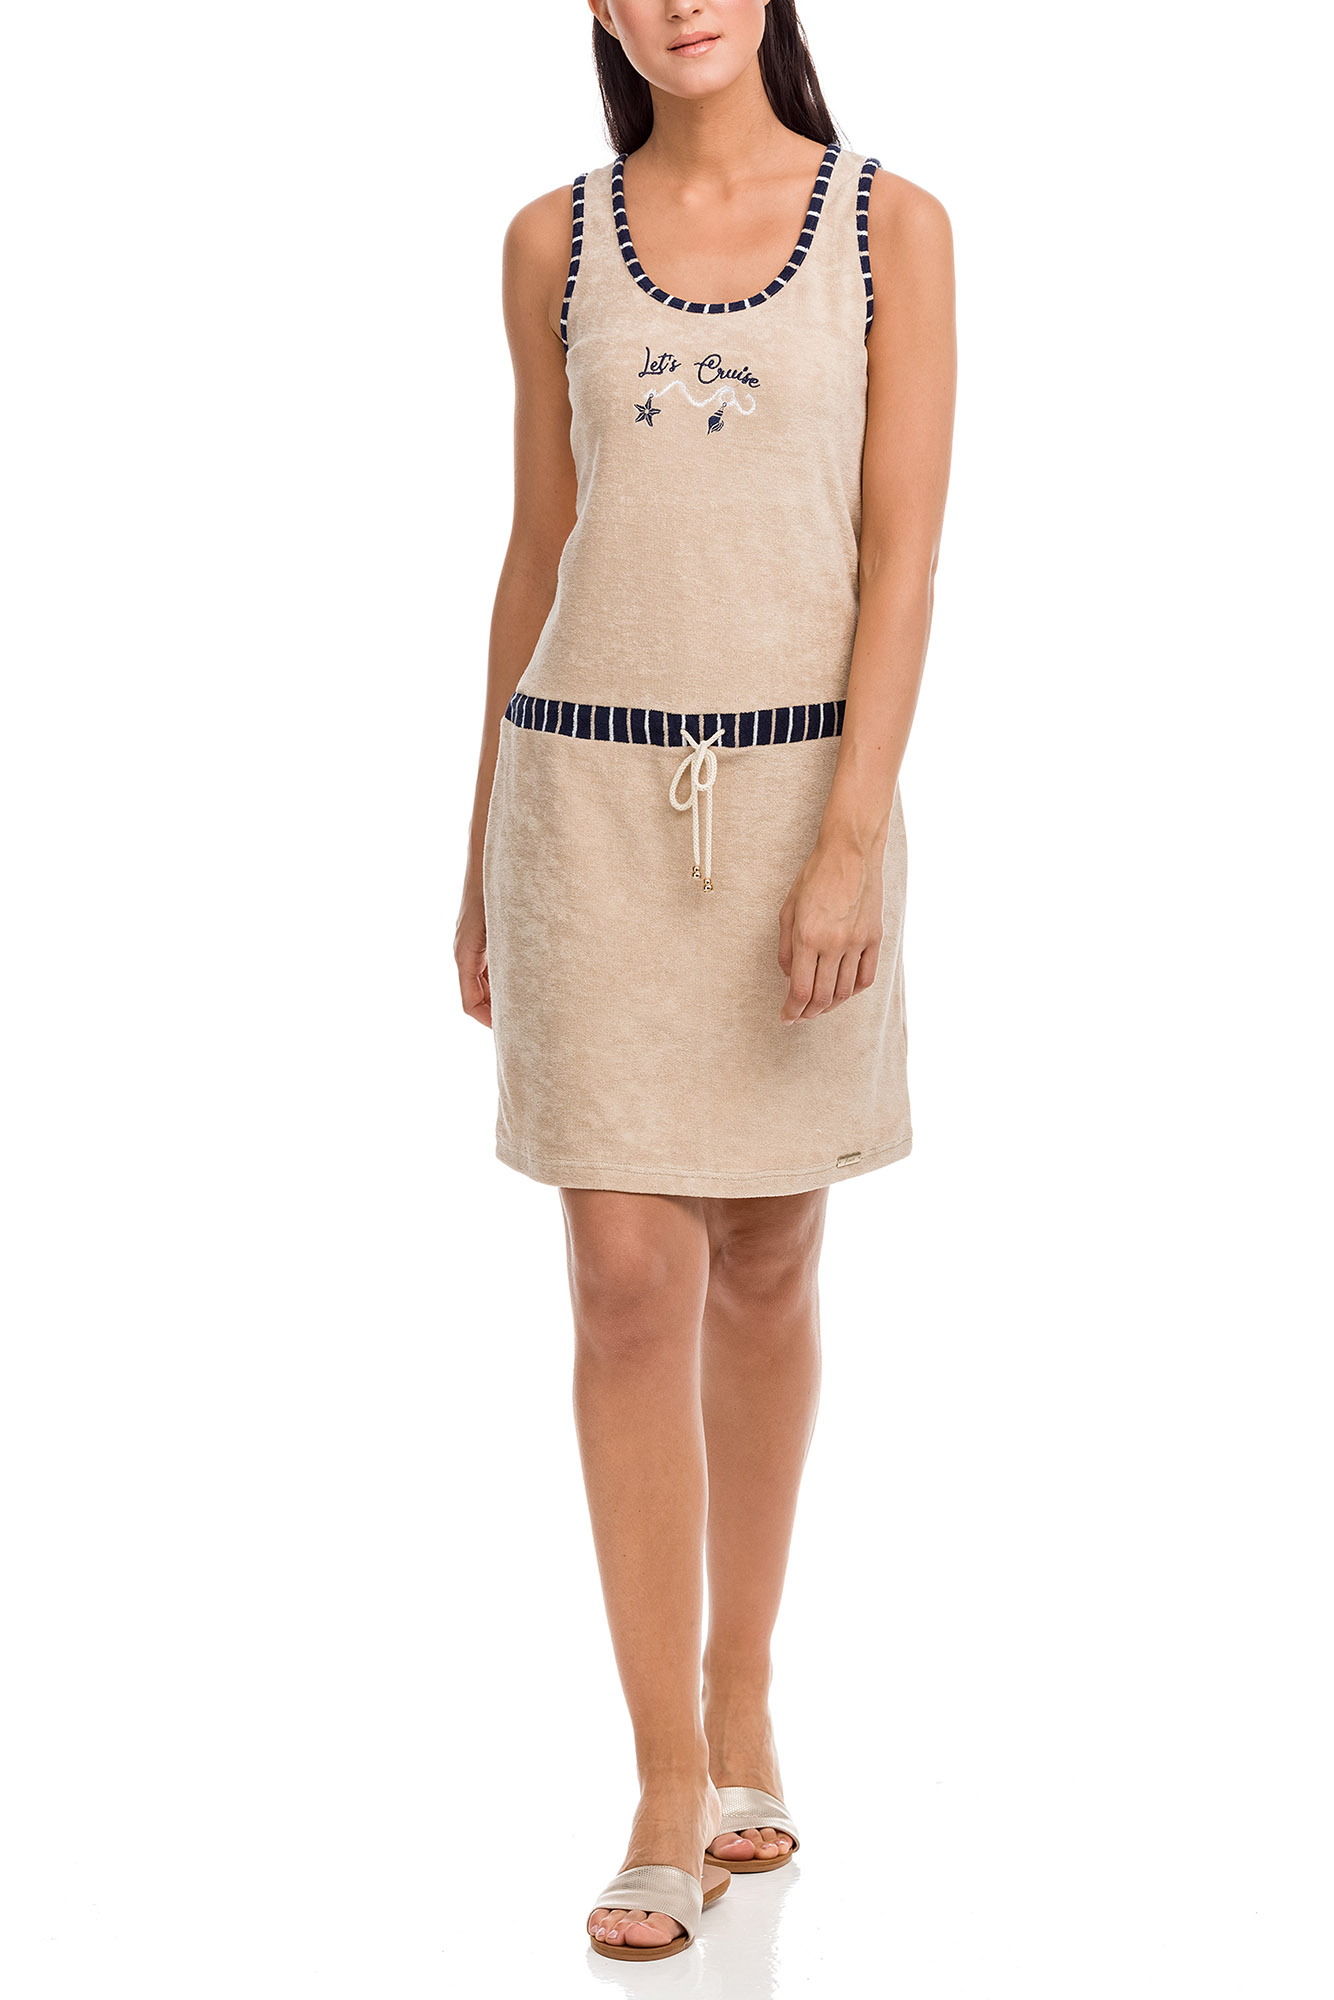 Vamp - Dámske šaty 12578 - Vamp beige peach xl